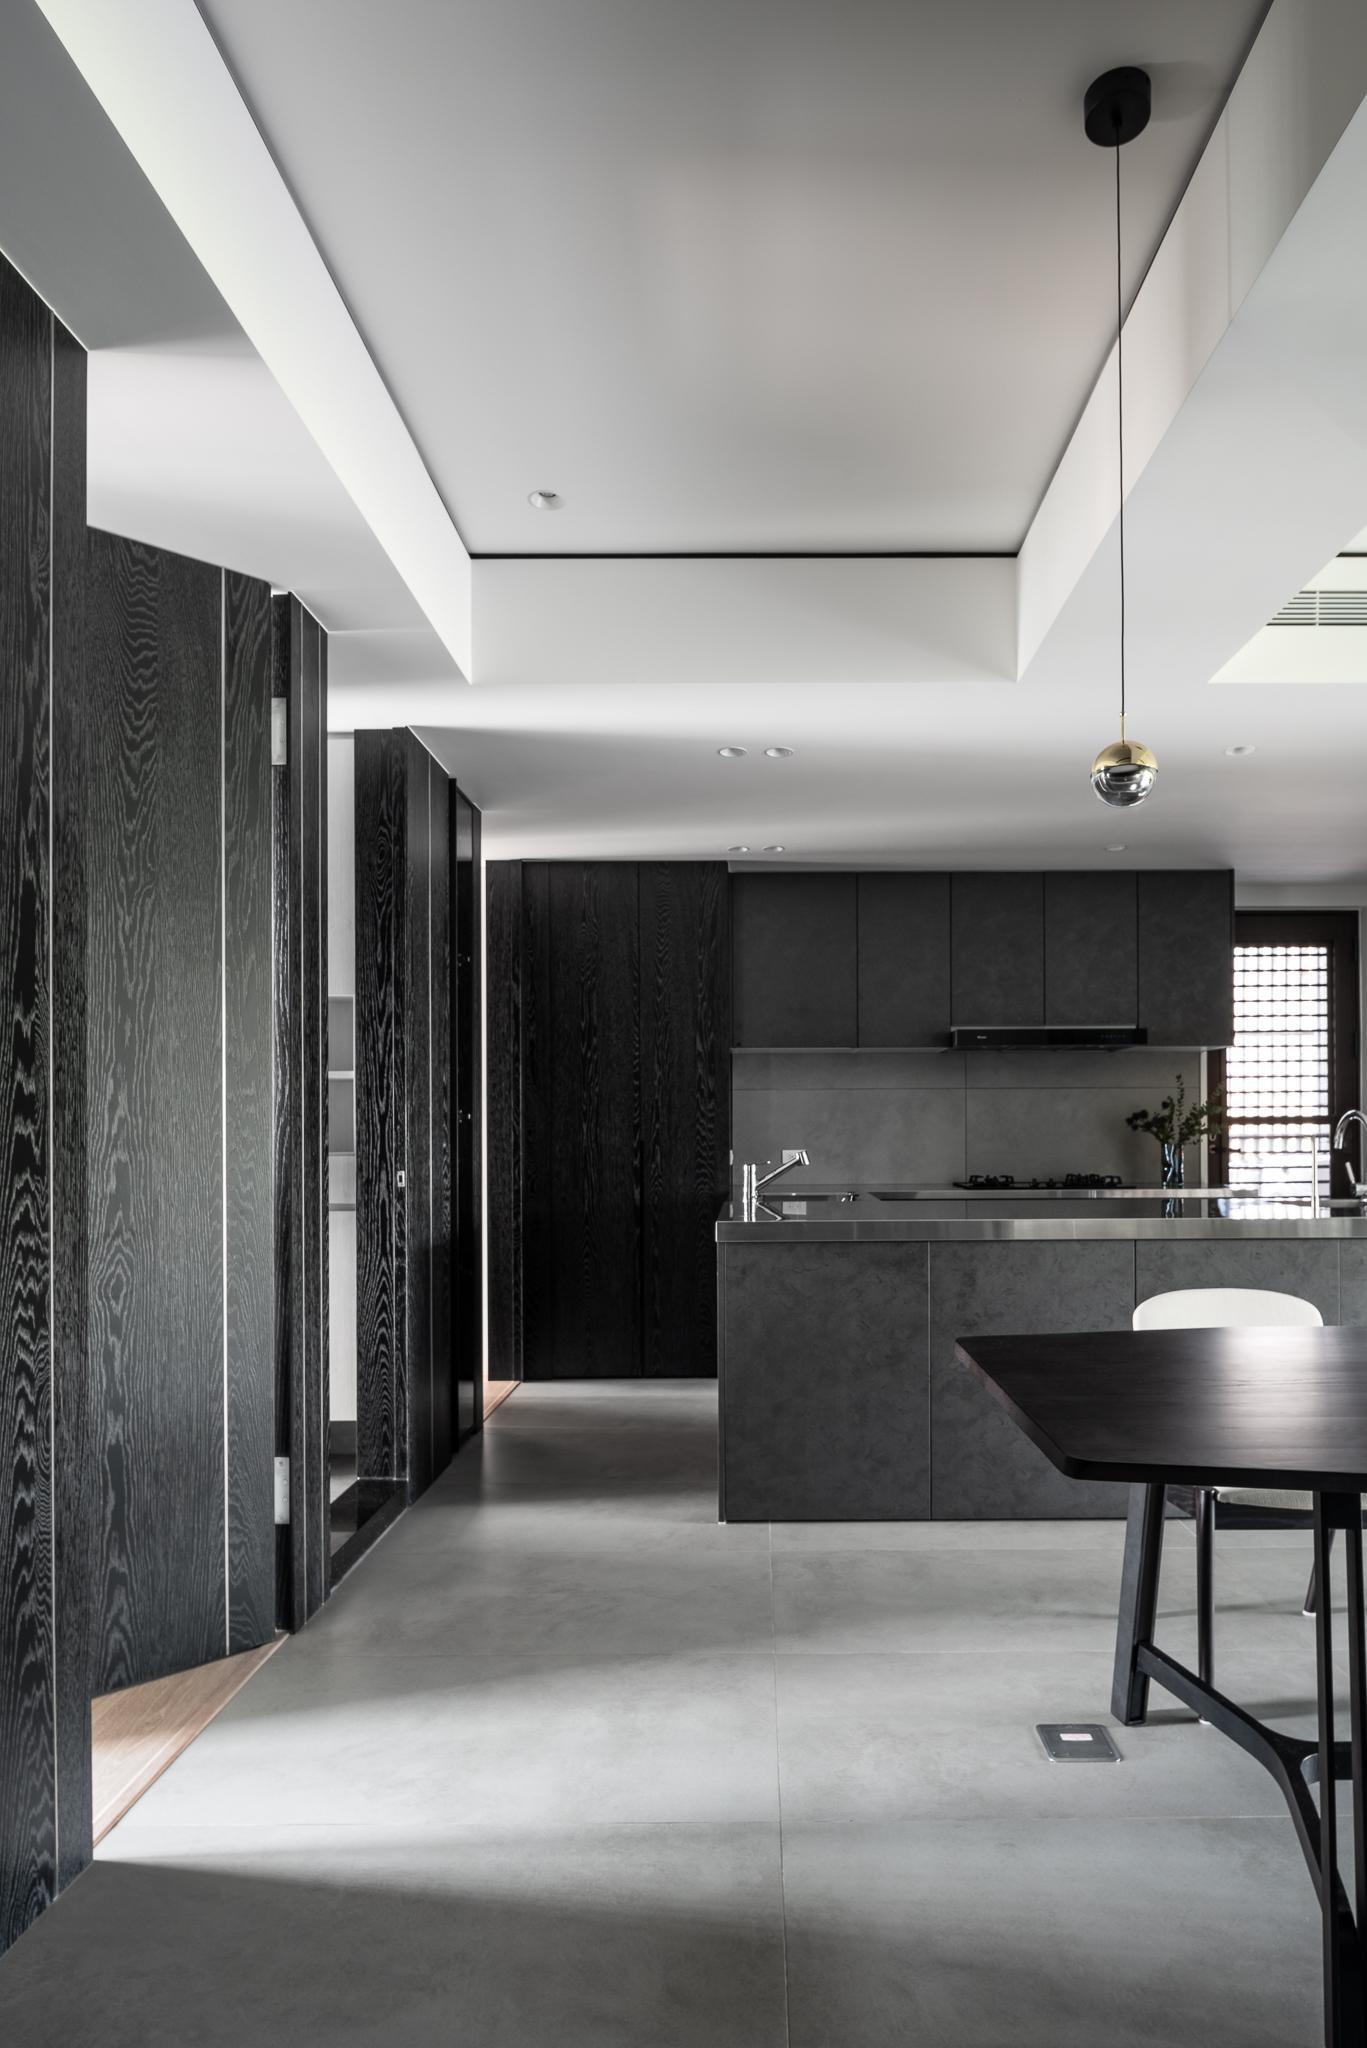 Interior Image 240